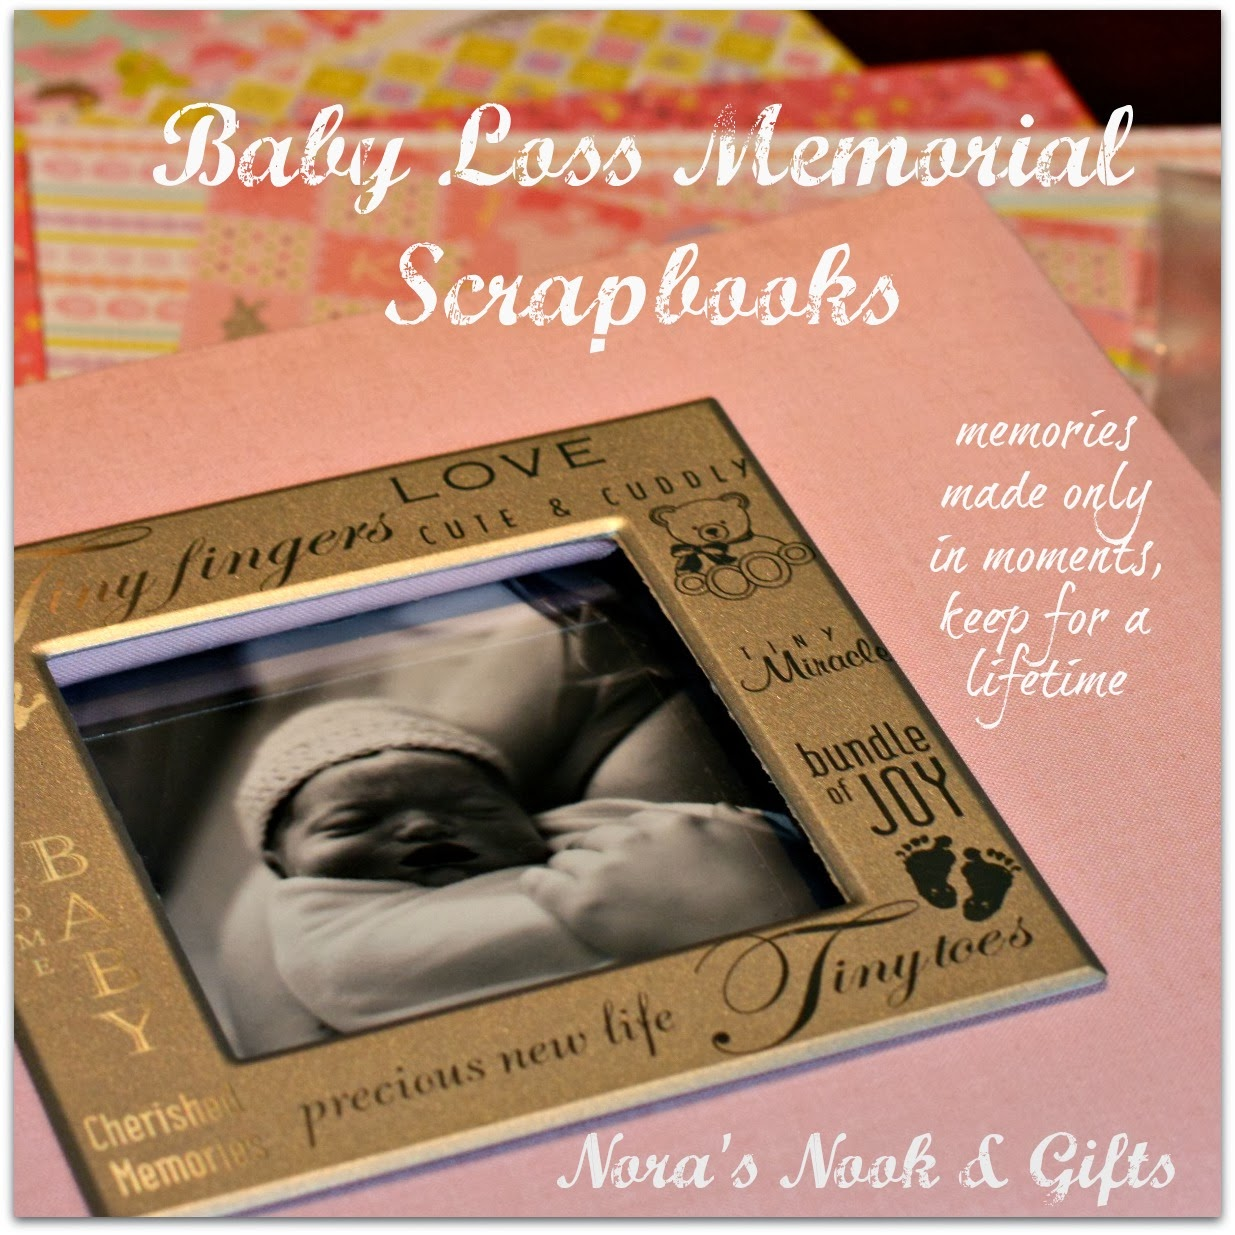 Scrapbook ideas grandma - Launching The Baby Loss Memorial Scrapbook Kits